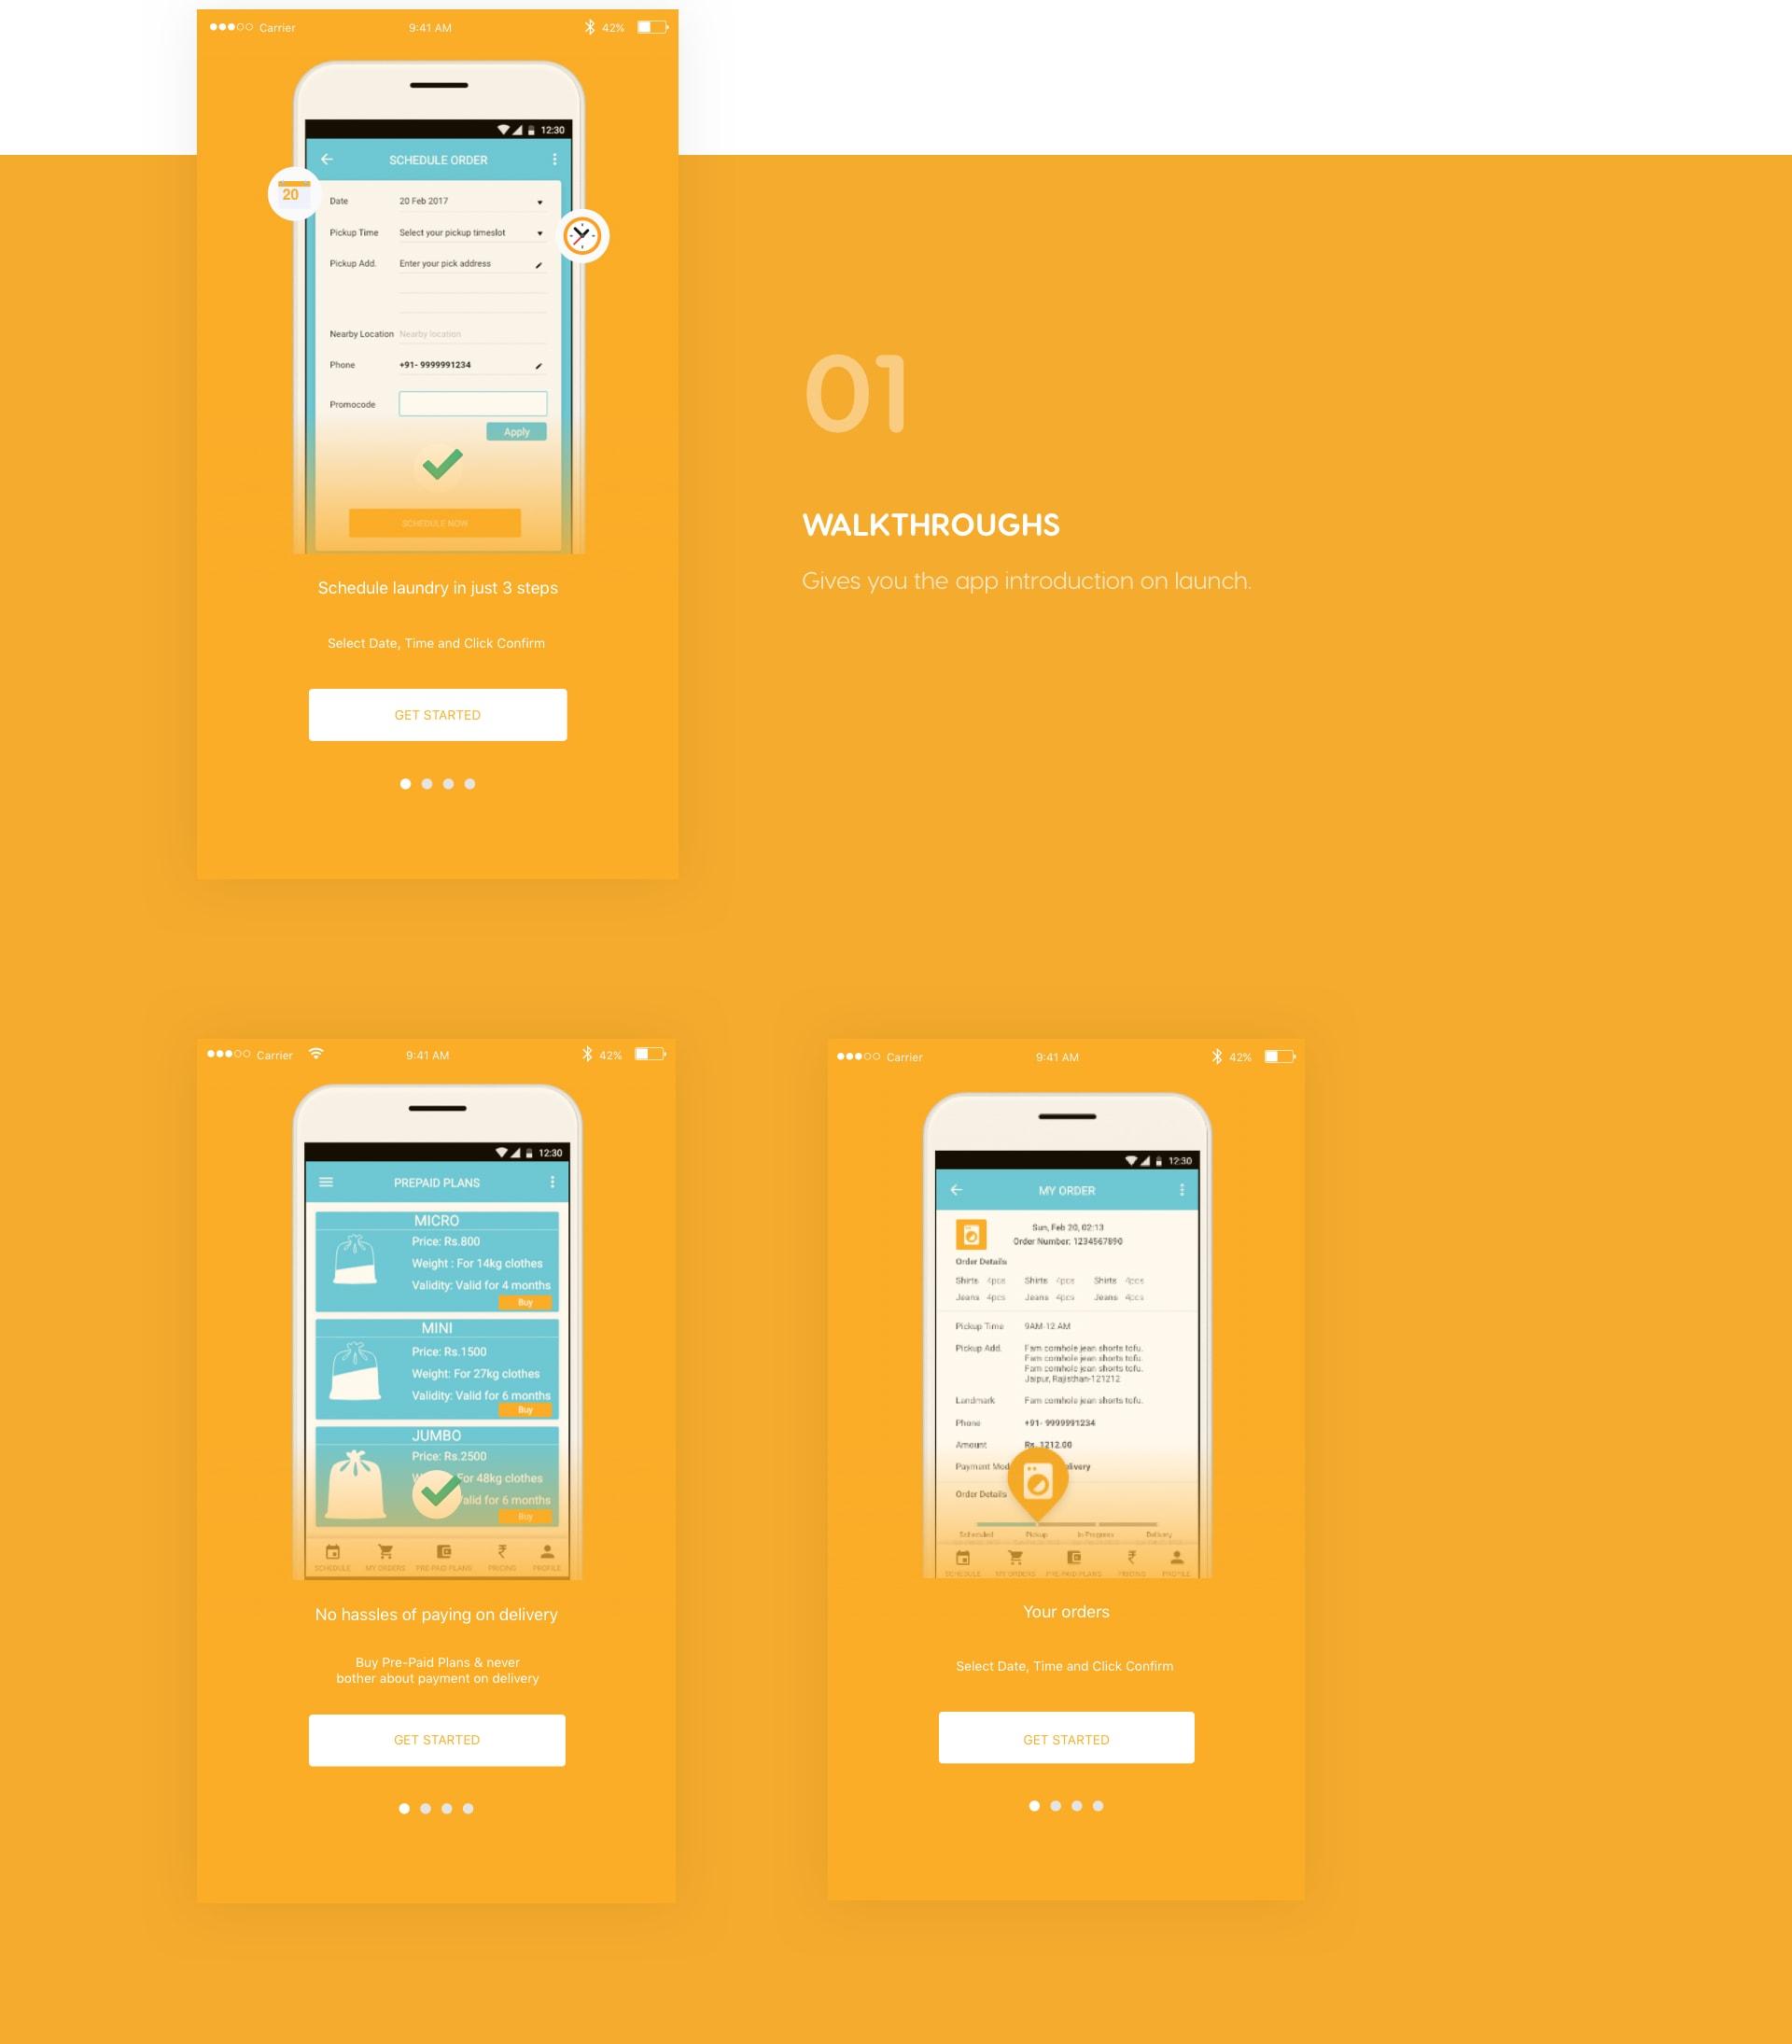 Walkthroughs -app introduction